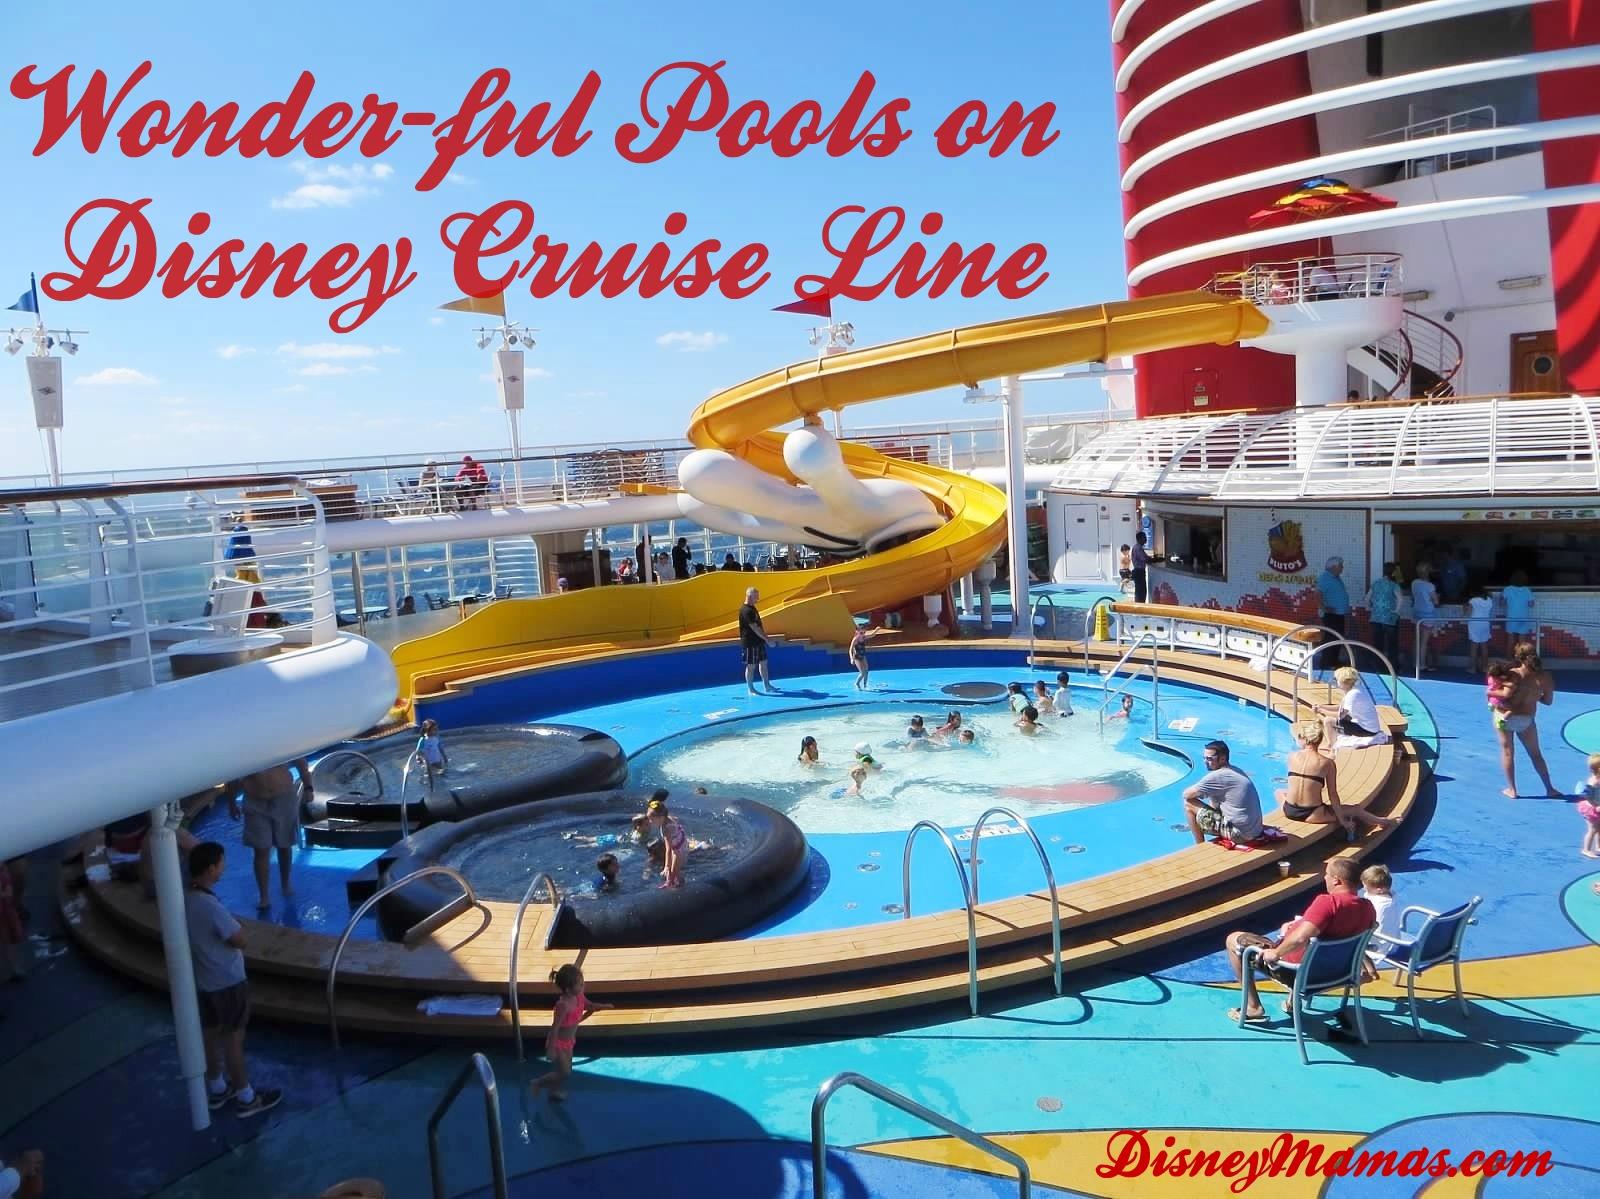 Disney Mamas Wonder-ful Pools On Disney Cruise Line